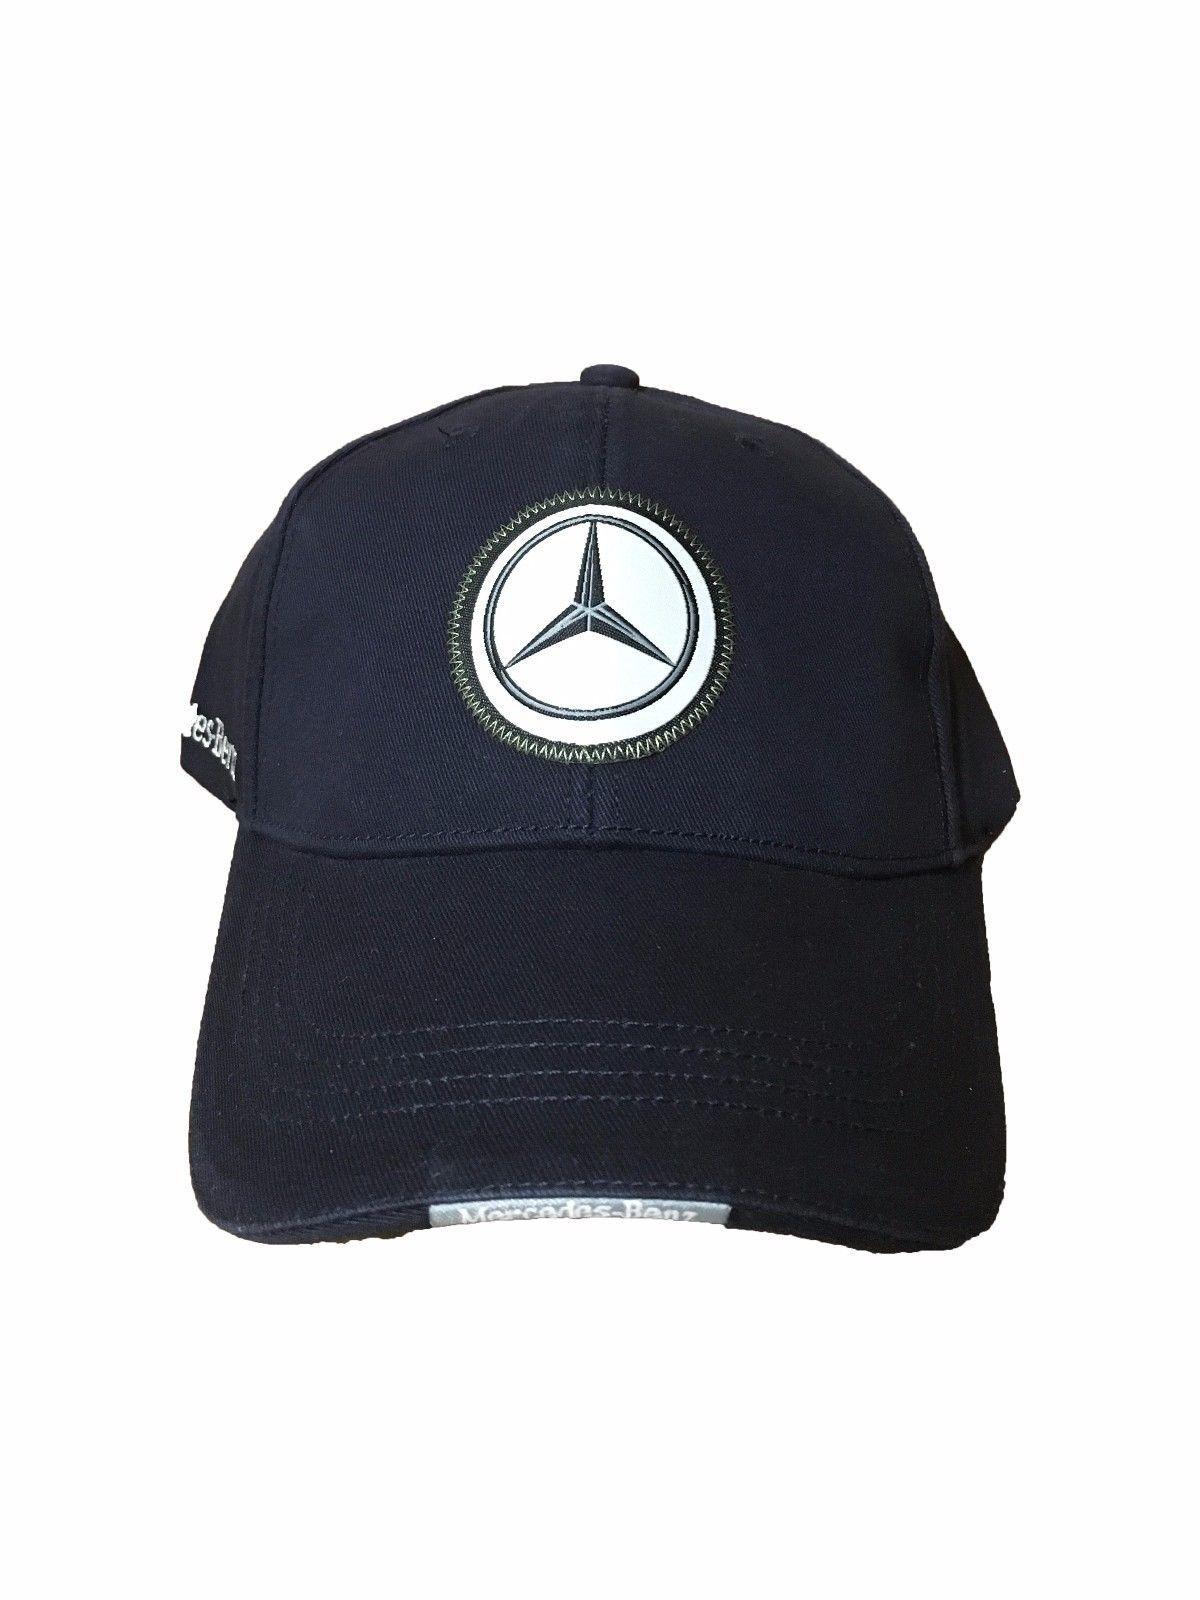 Mercedes Benz Hat Cap Adjustable Navy Blue Men s  f89dfeae8998